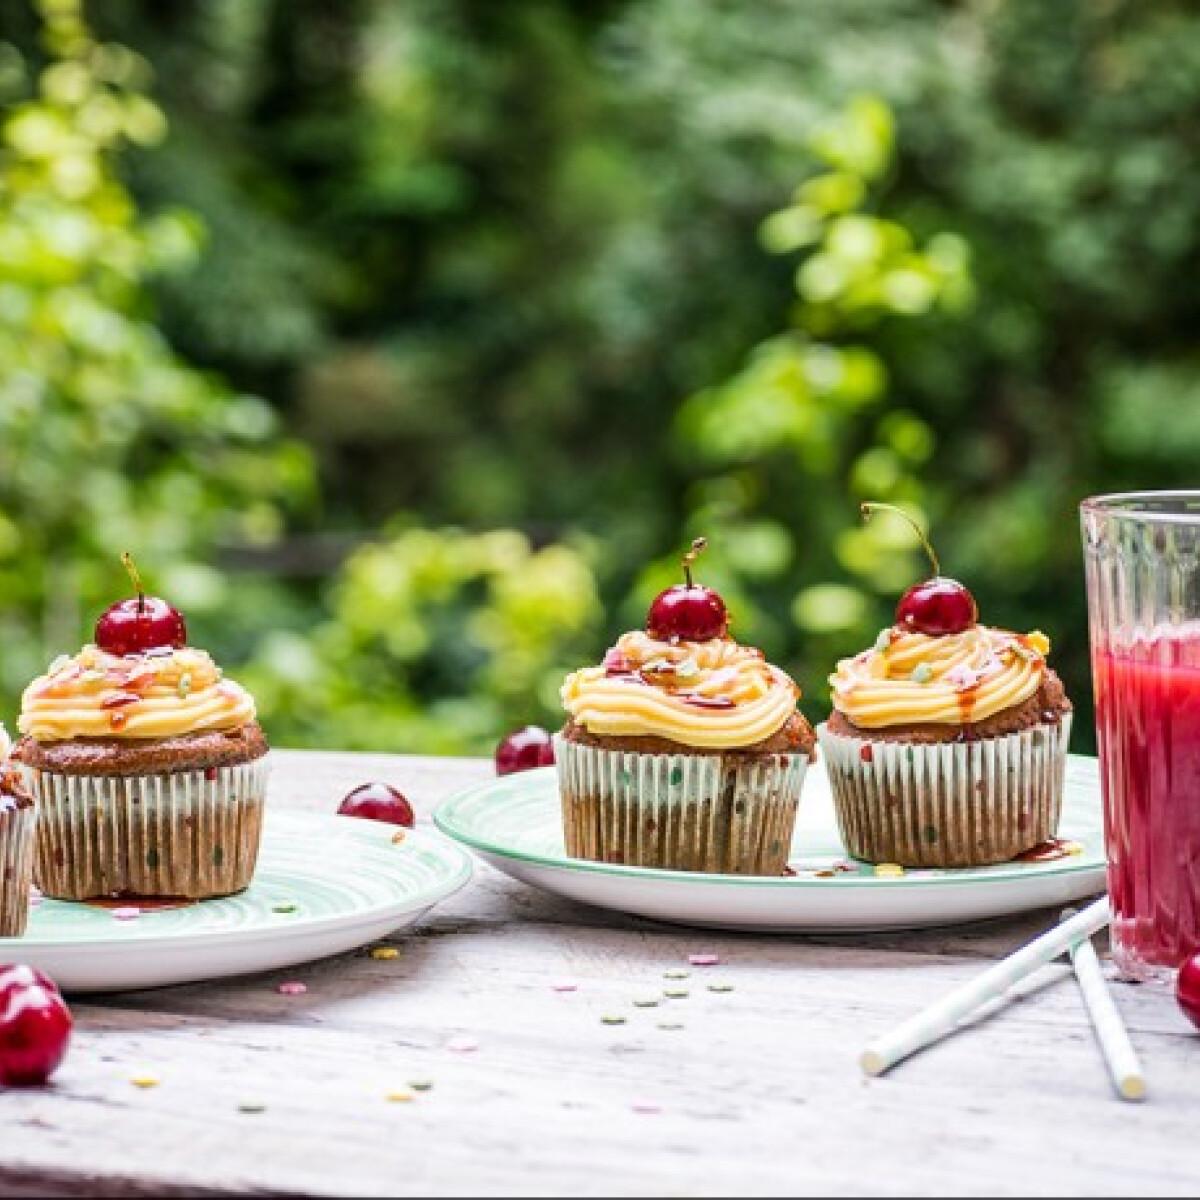 Ezen a képen: Meggyhabos muffin